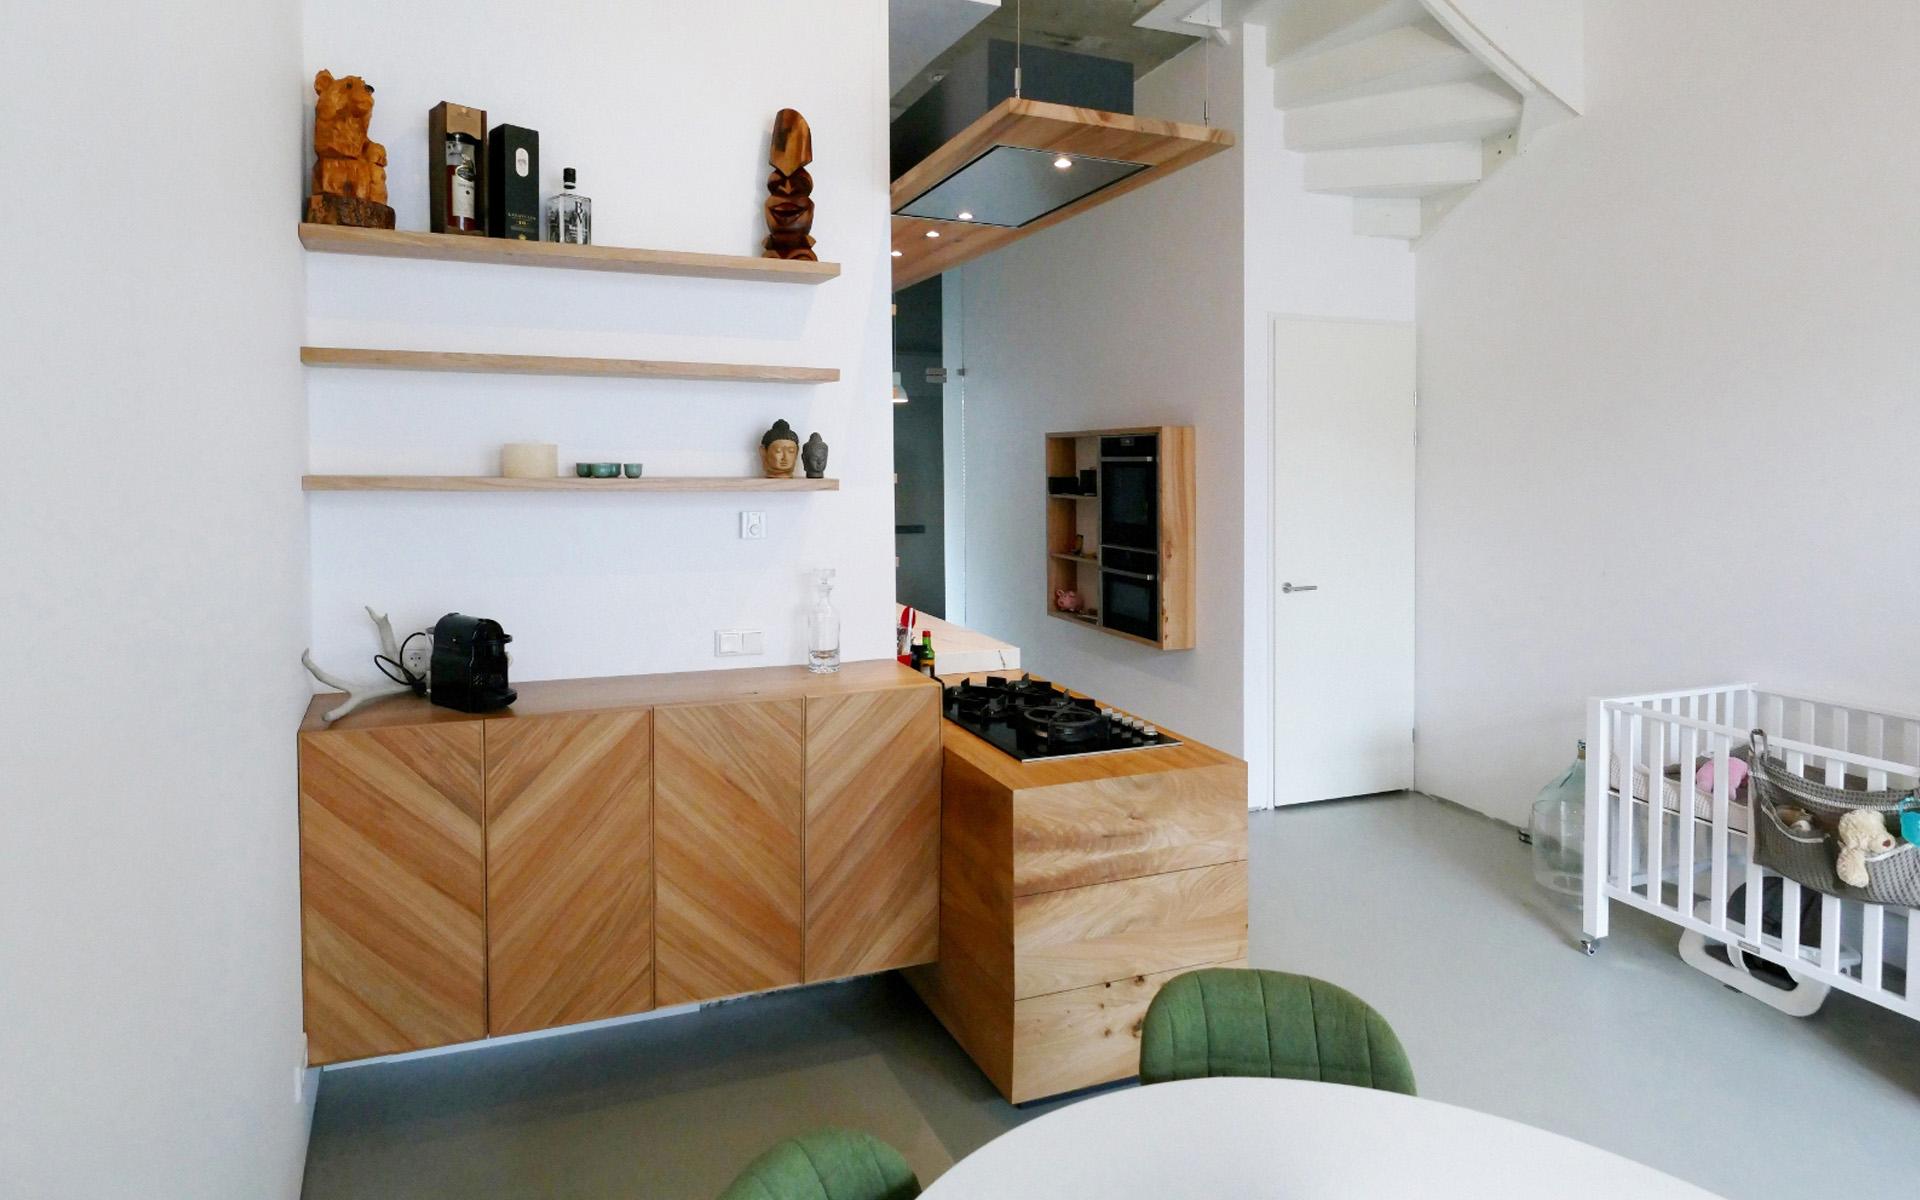 Design Keuken Breda : Keukens breda beste van mooihuis design keukens breda